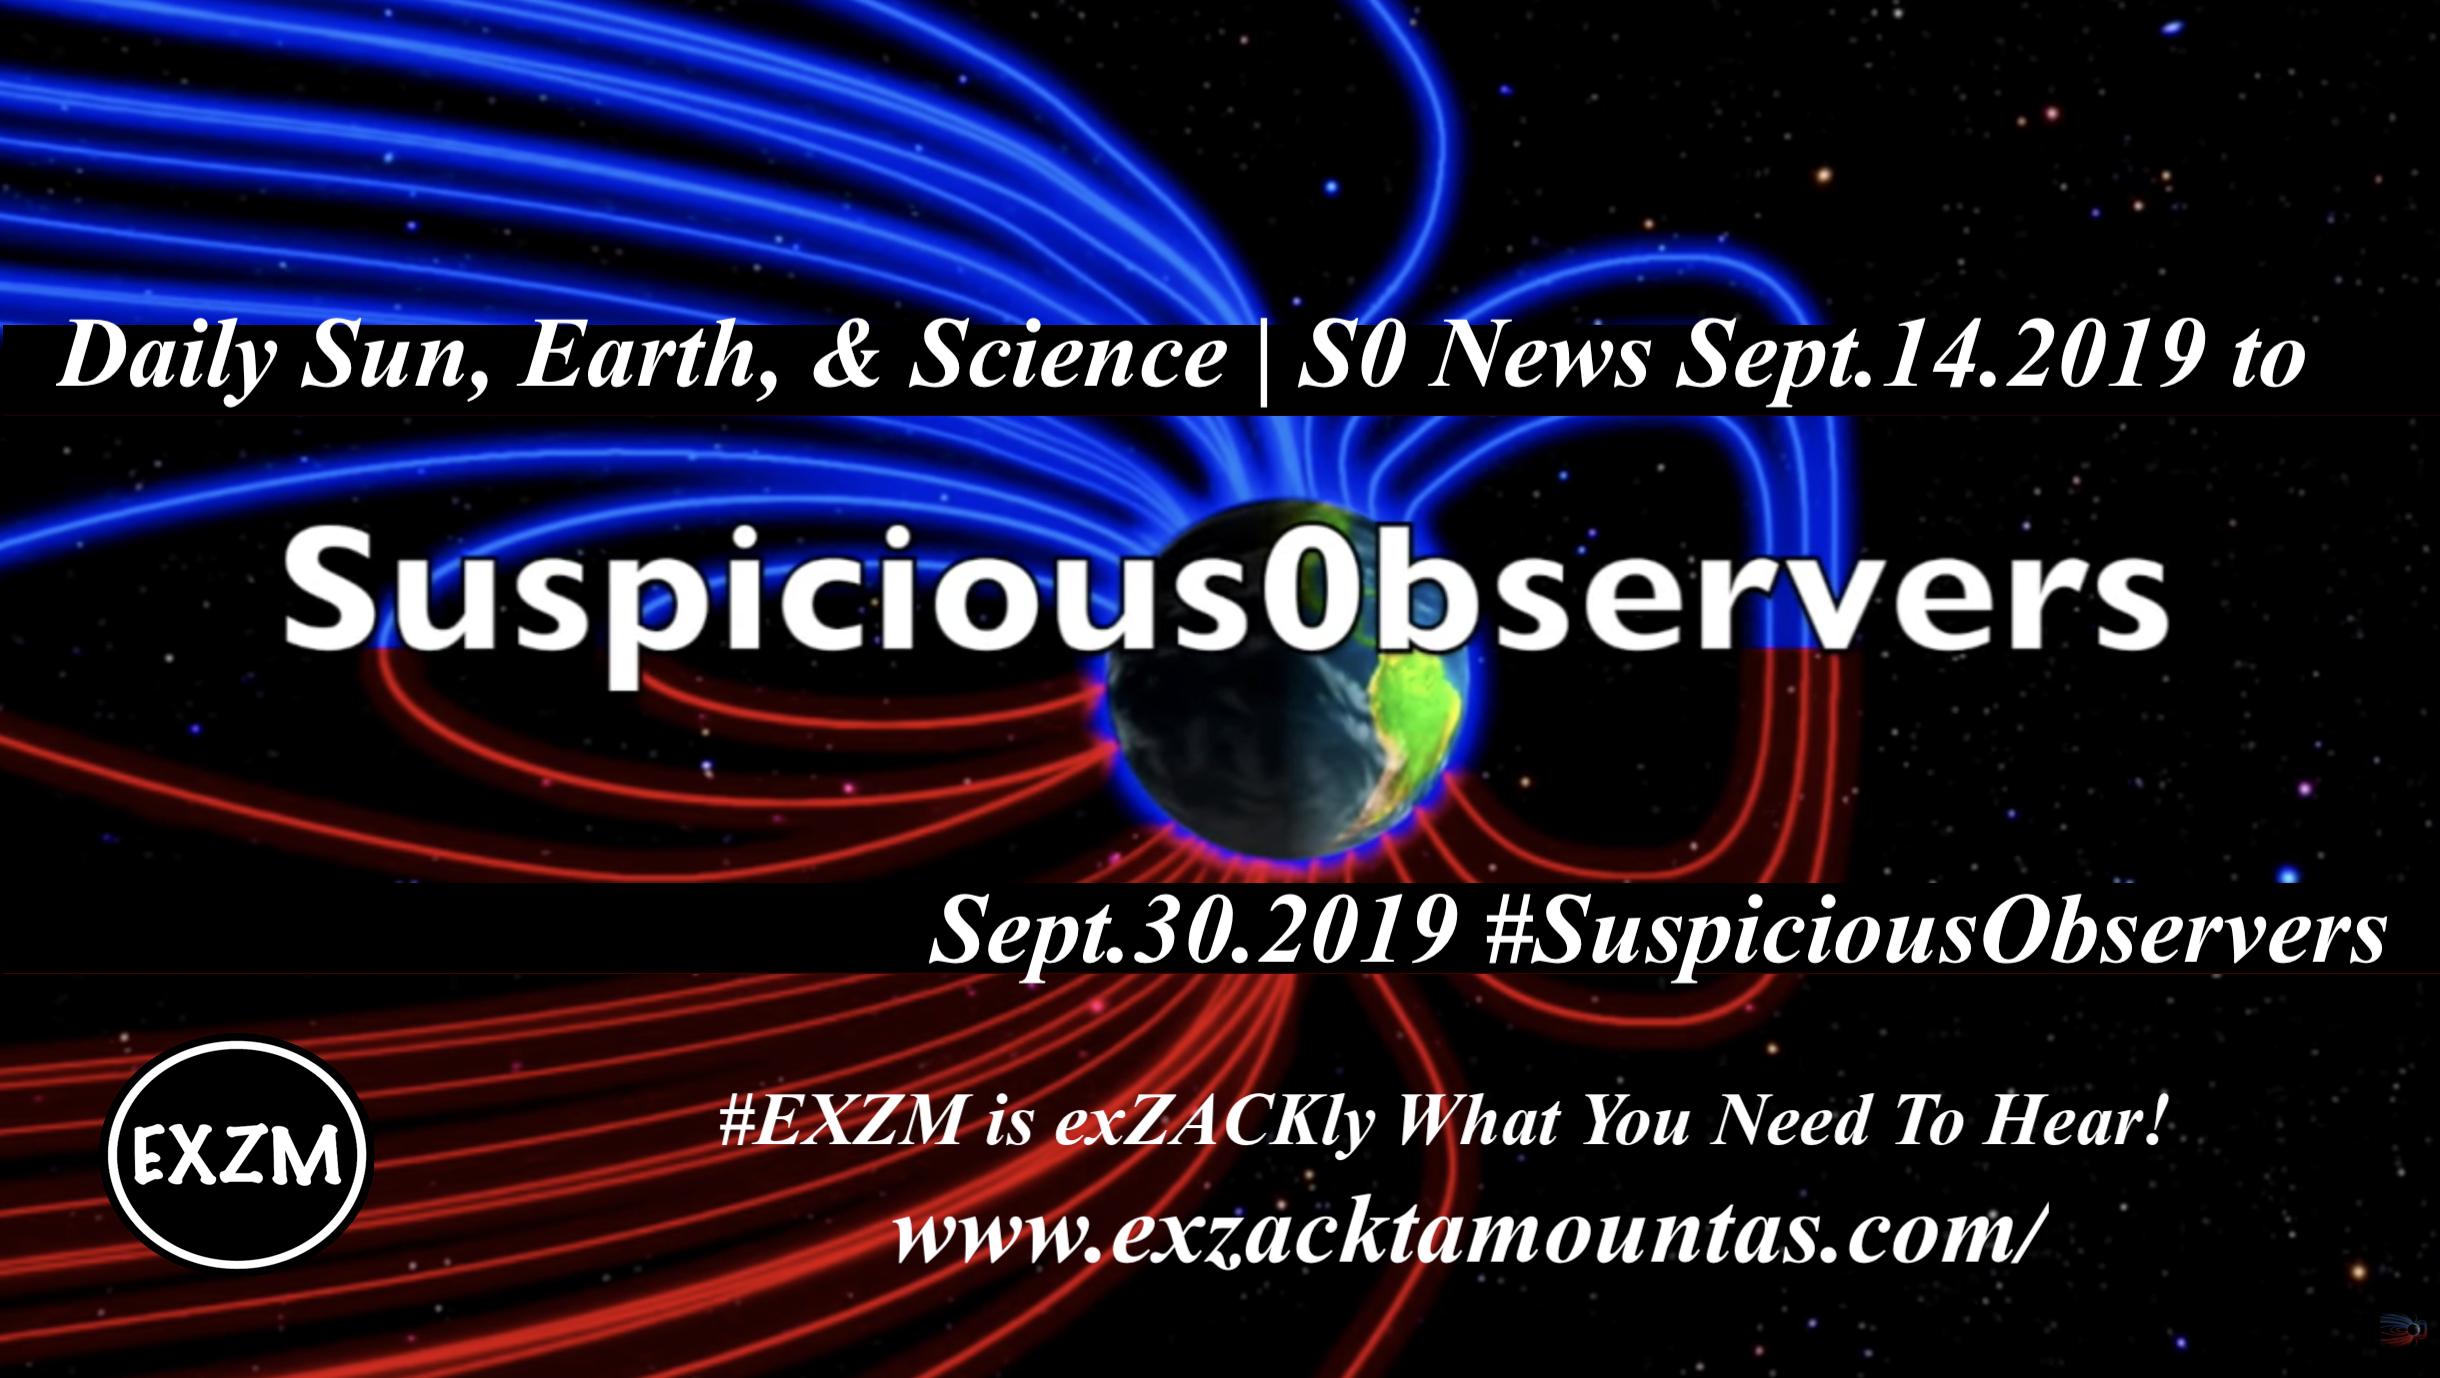 EXZM Suspicious Observers 11 4 2019